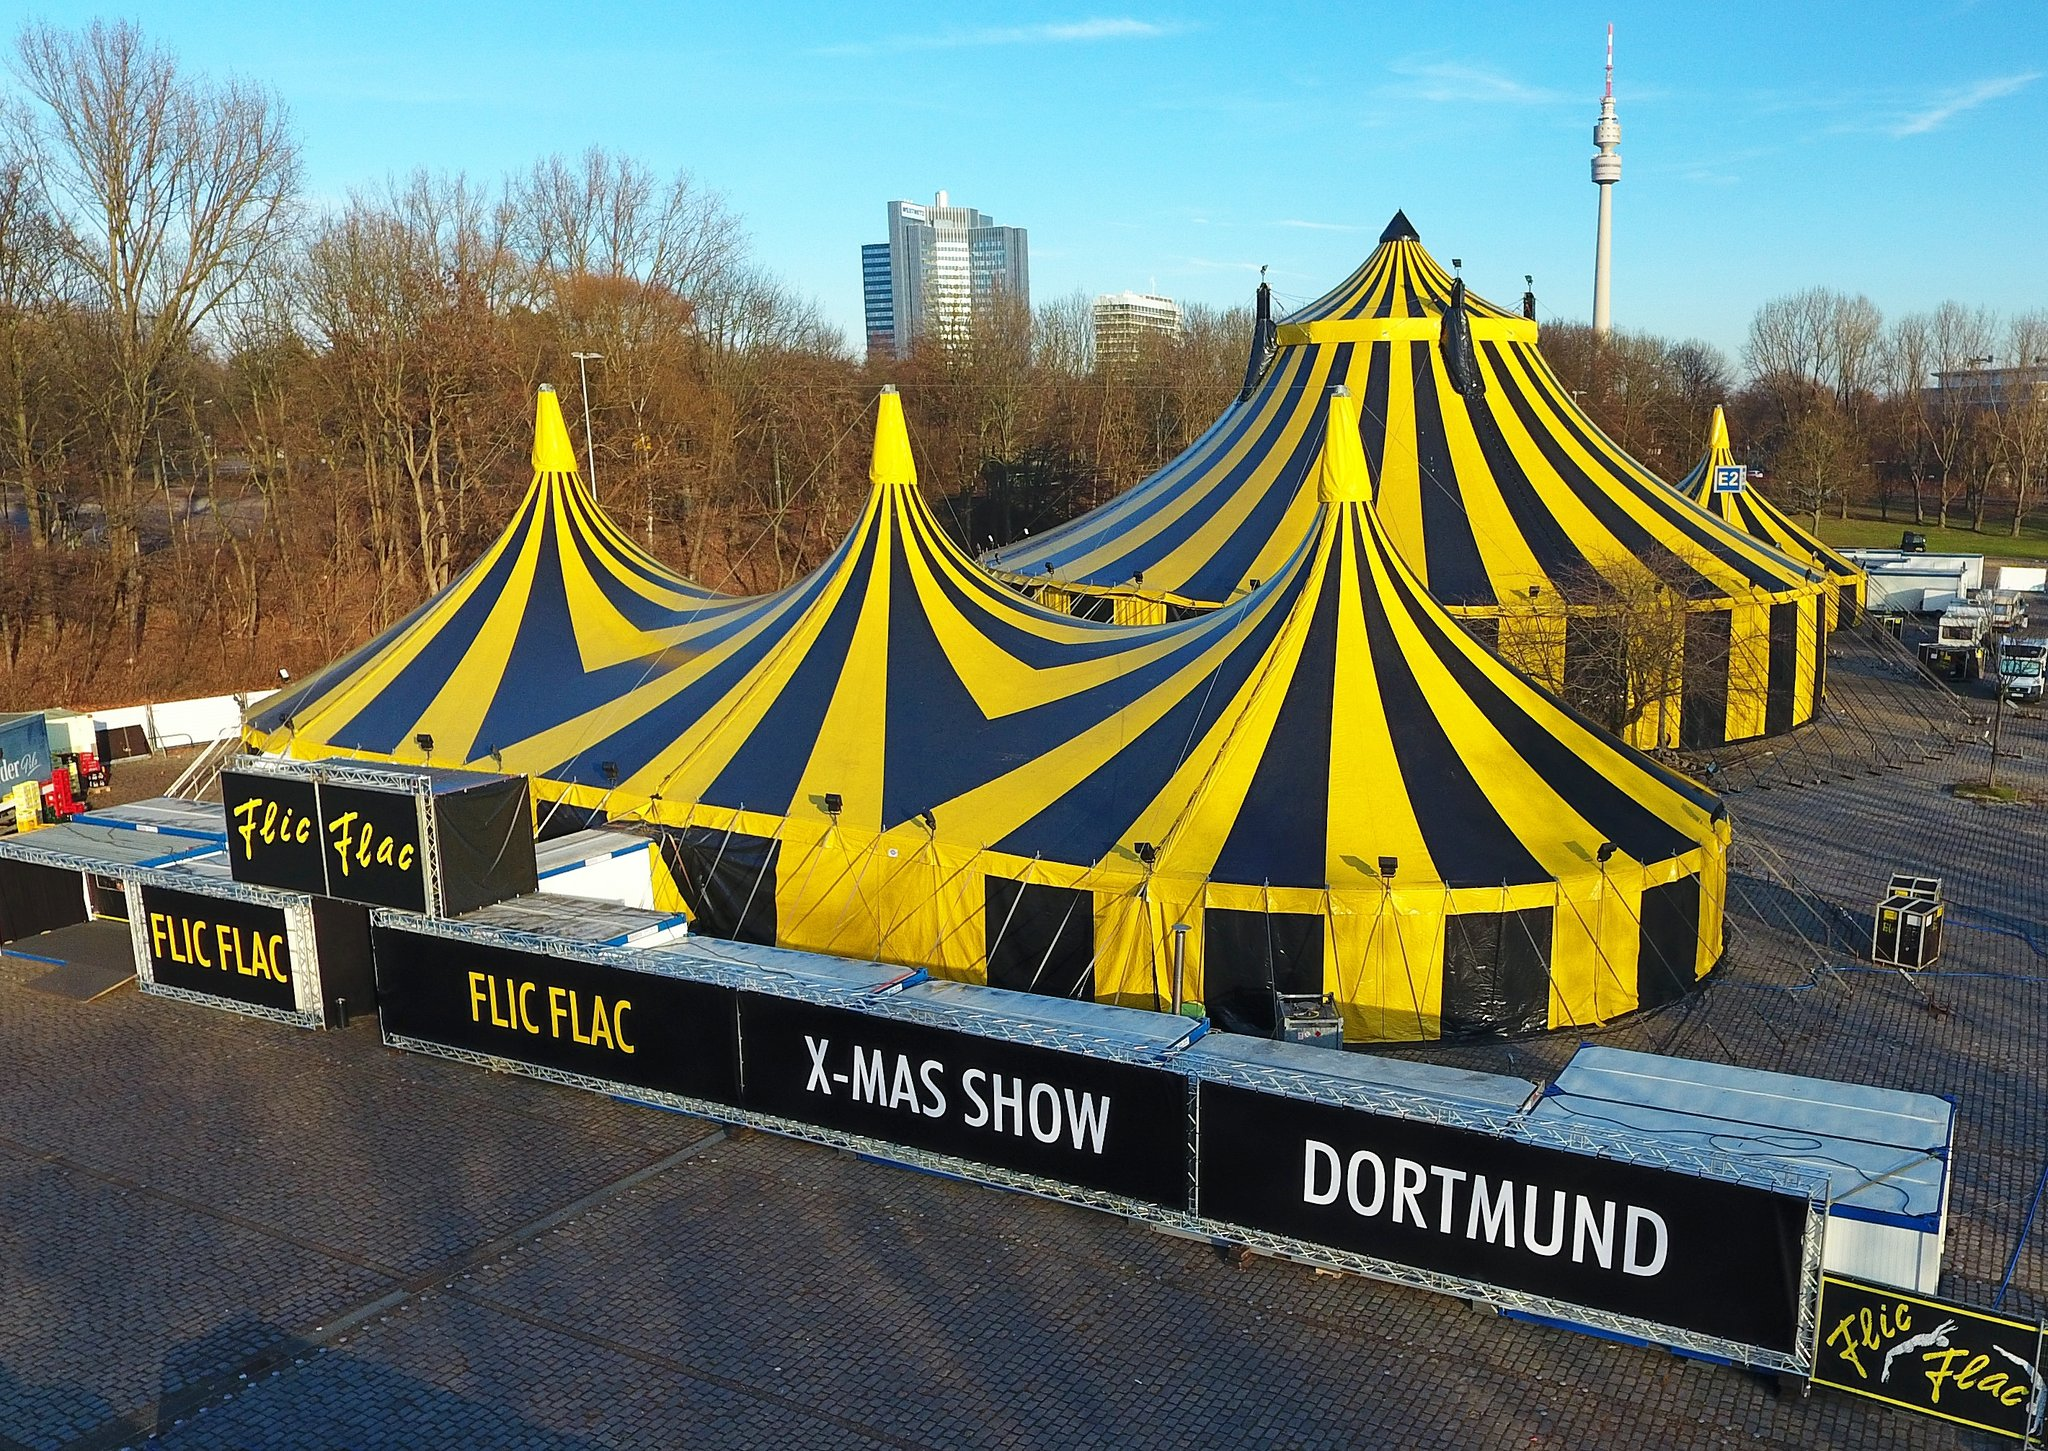 Circus Flic Flac Nürnberg